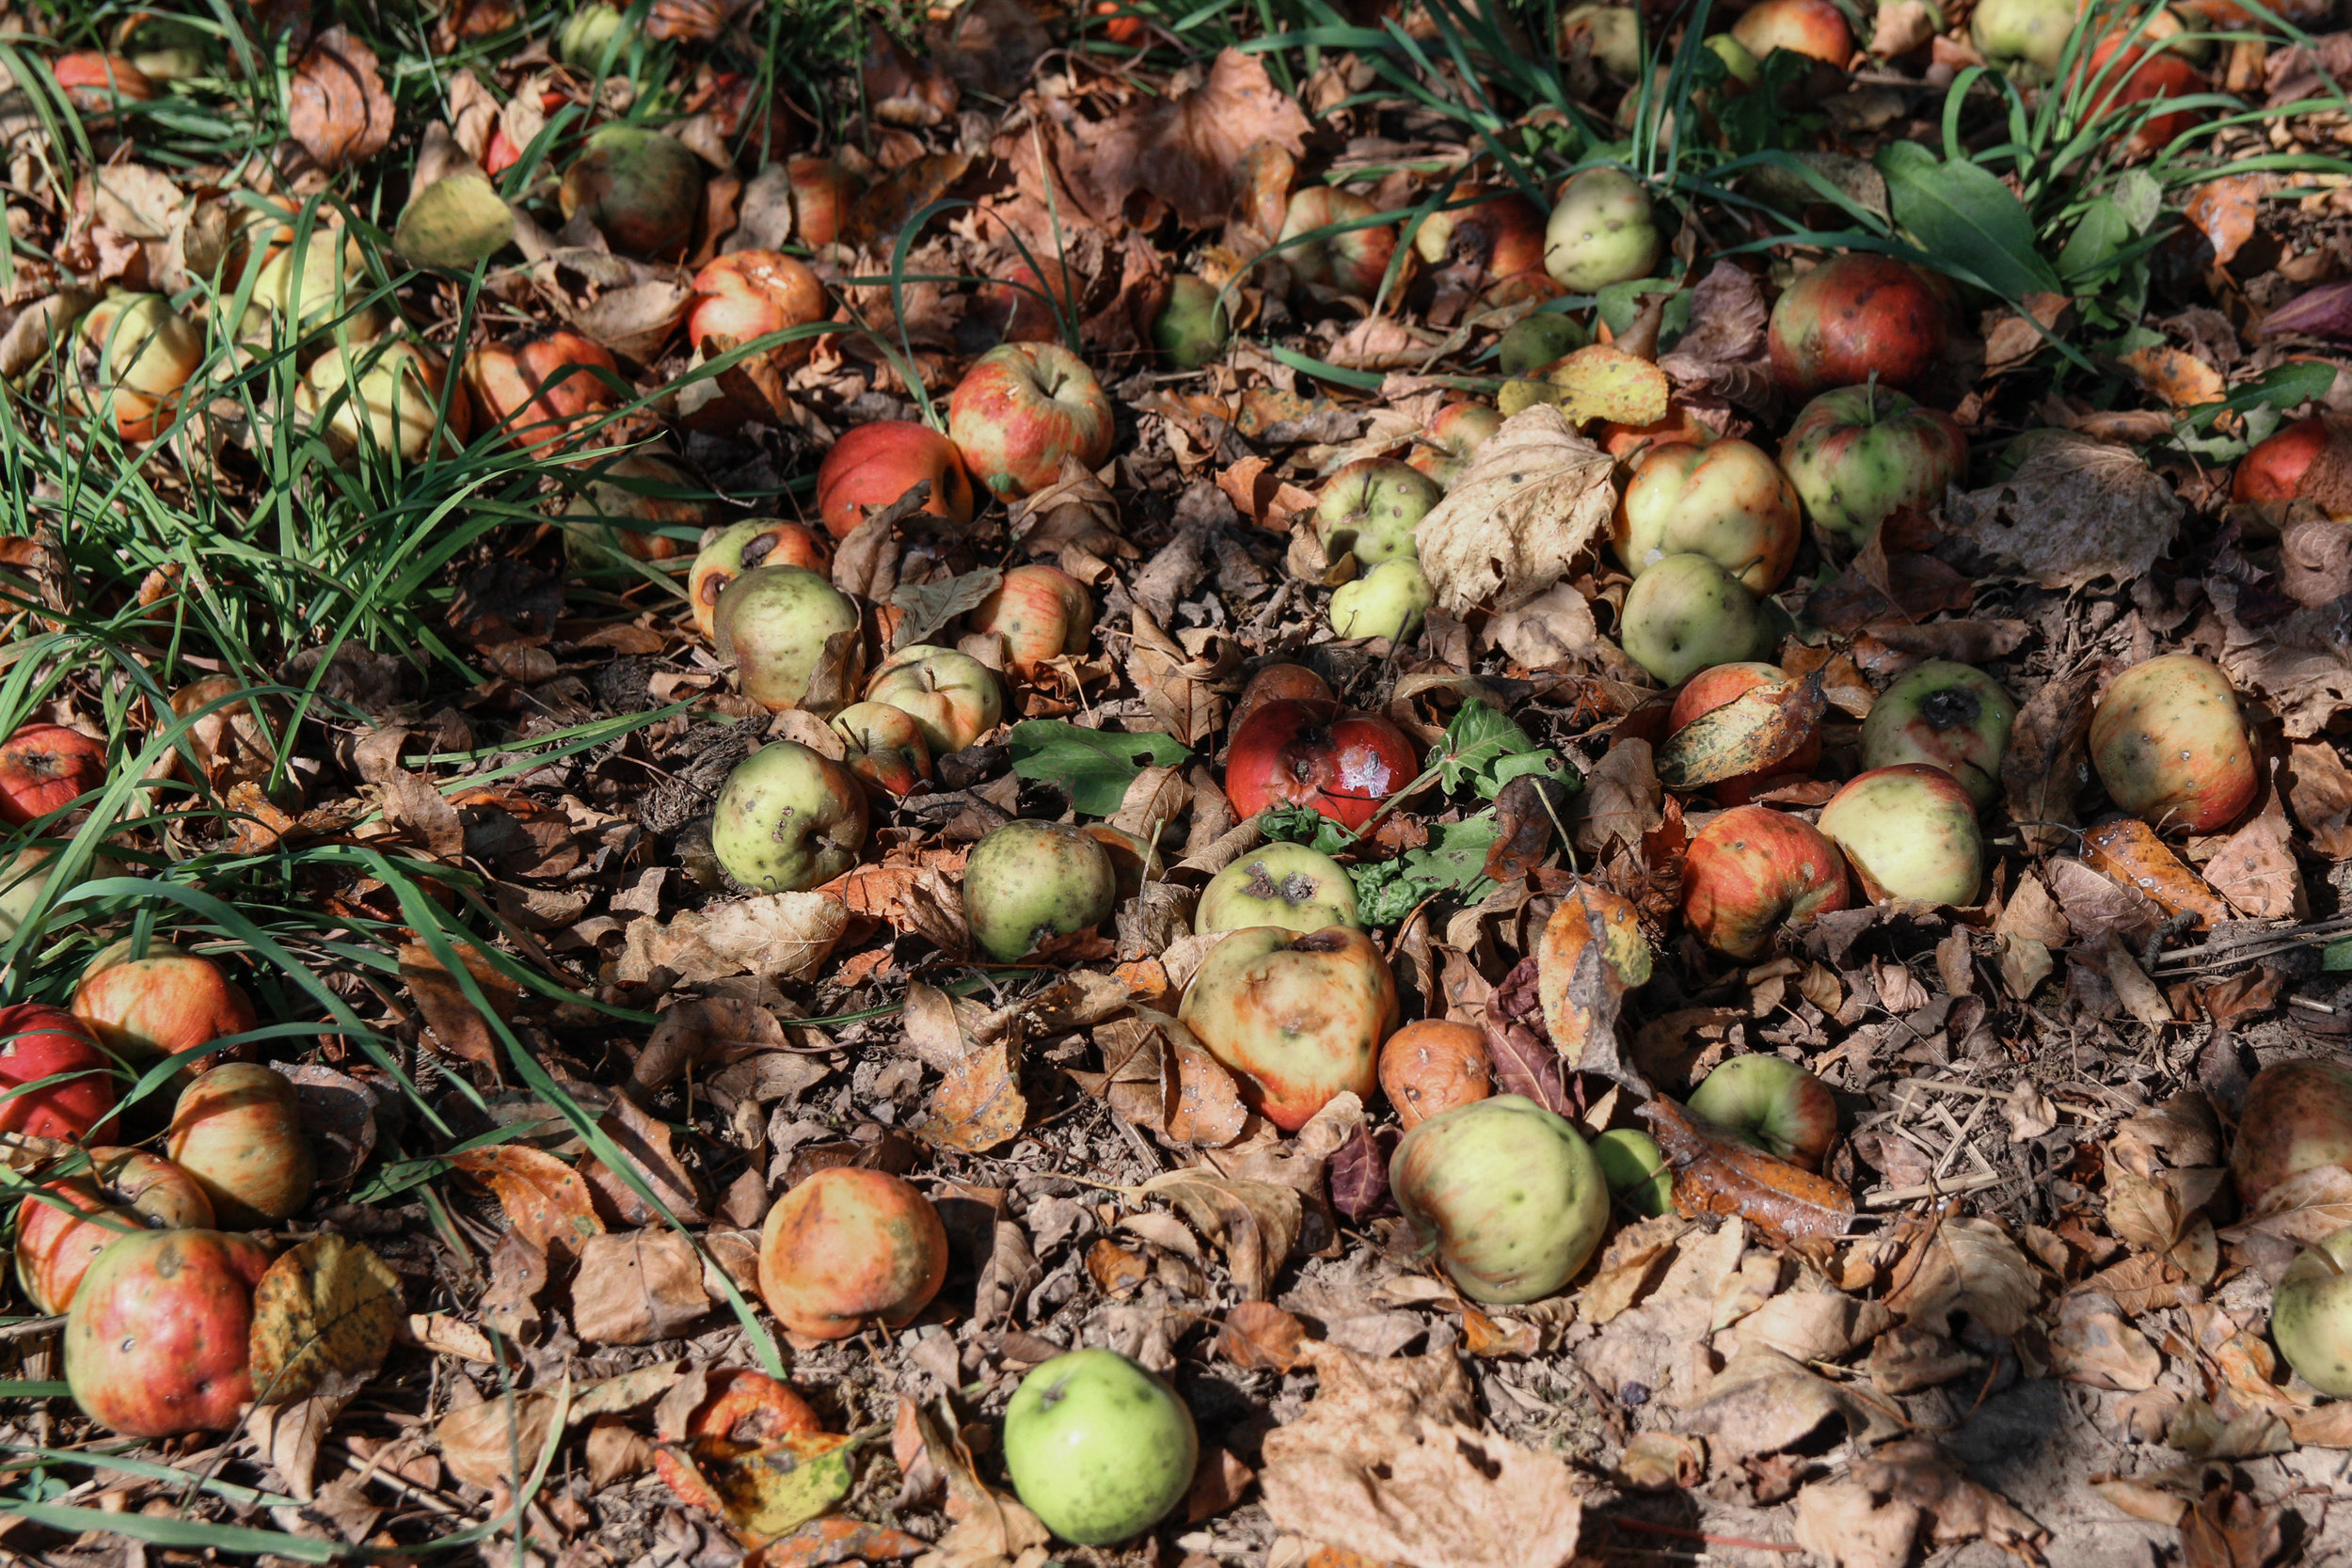 farm apples-7.jpg